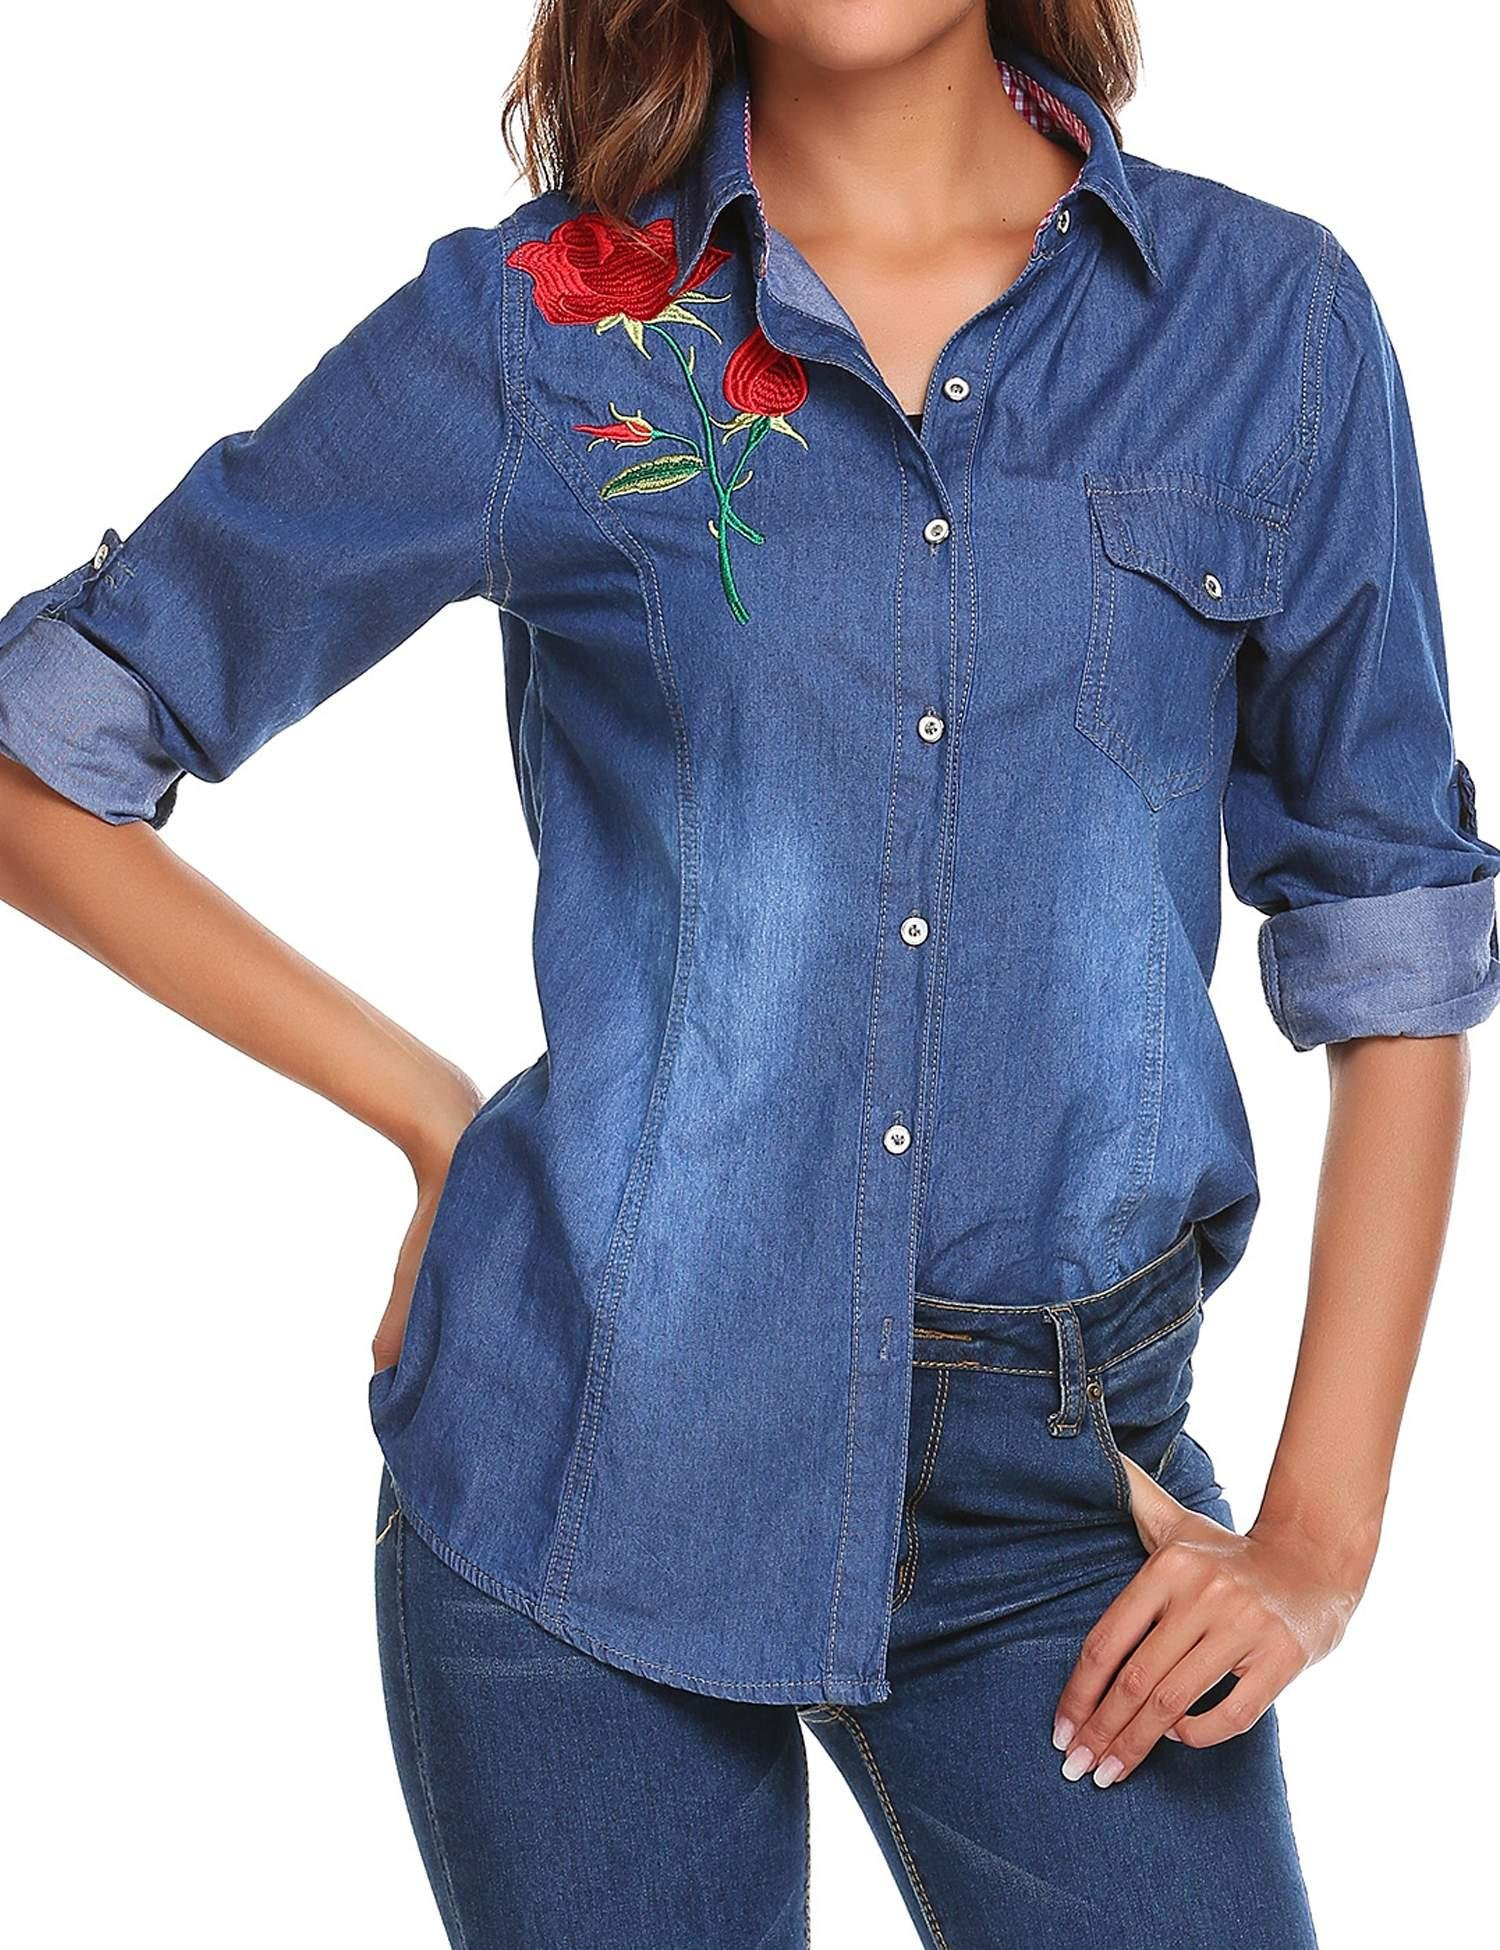 9543567233a SoTeer Women s Basic   Classic Casual Slim Button Down Denim Chambray Shirt  ...